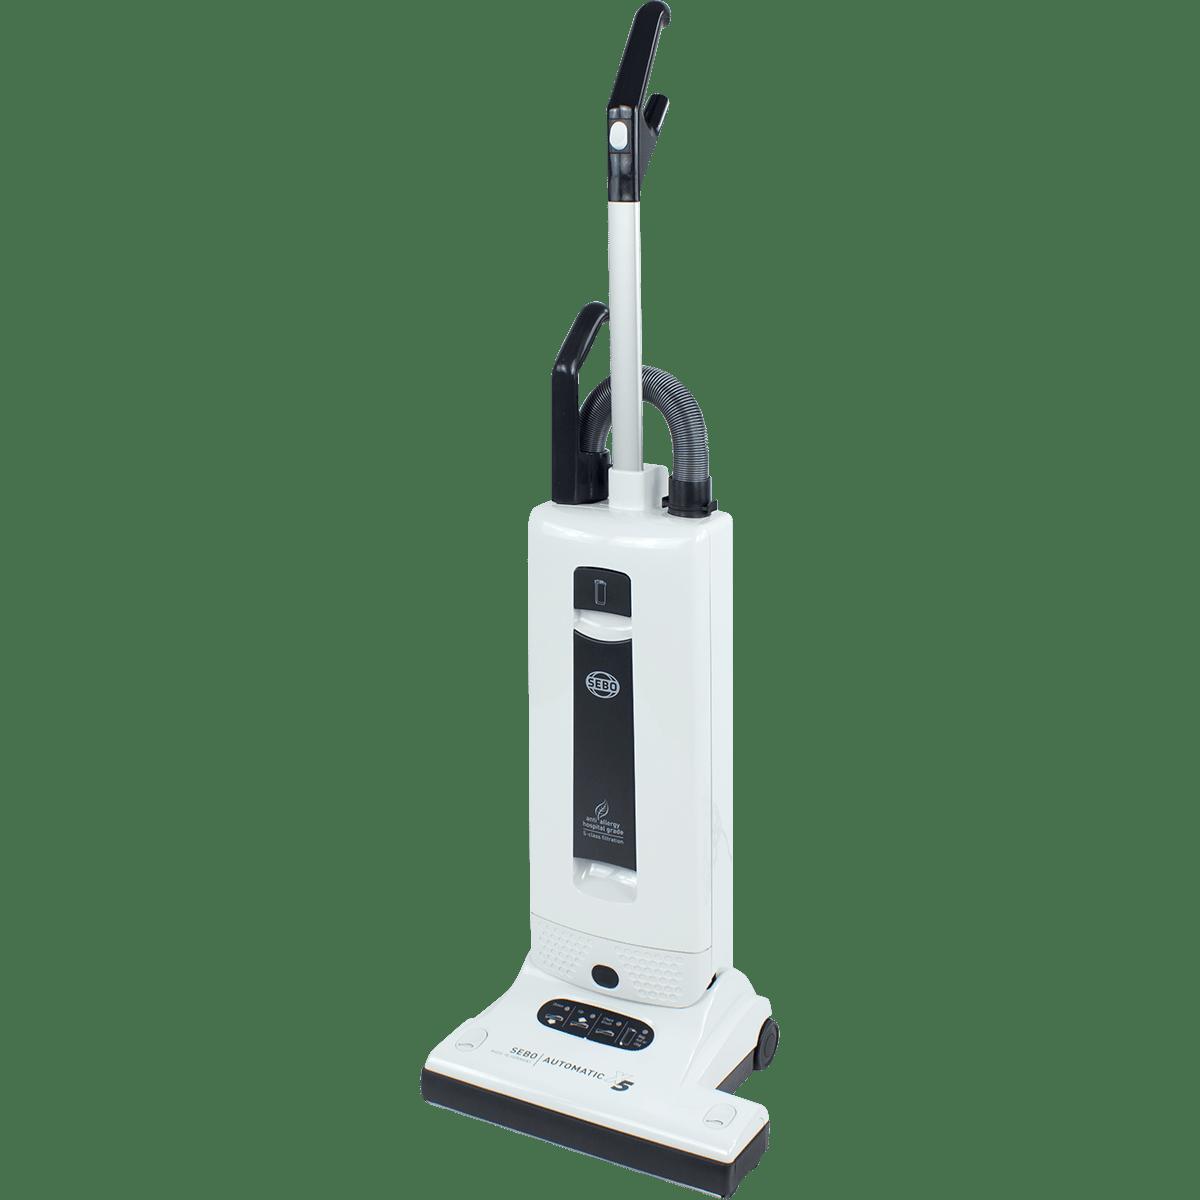 SEBO 9580AM Automatic X5 Upright Vacuum Cleaner